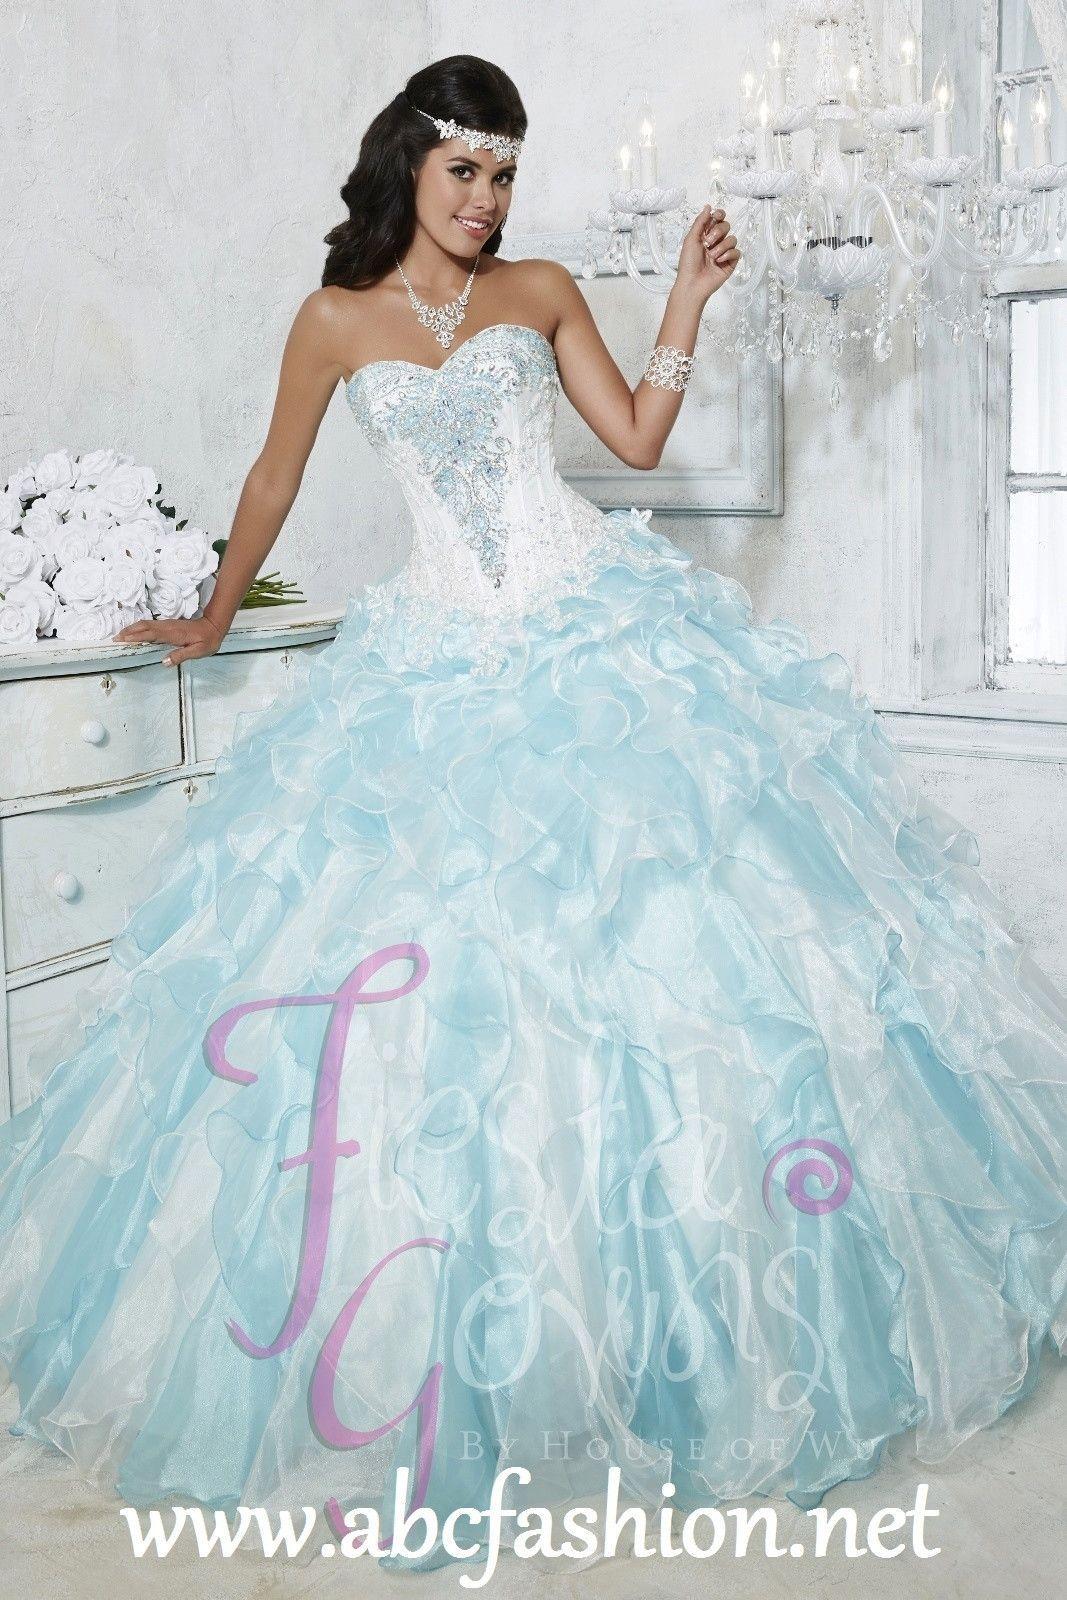 House of wu fiesta gowns quinceanera dress style fiestas